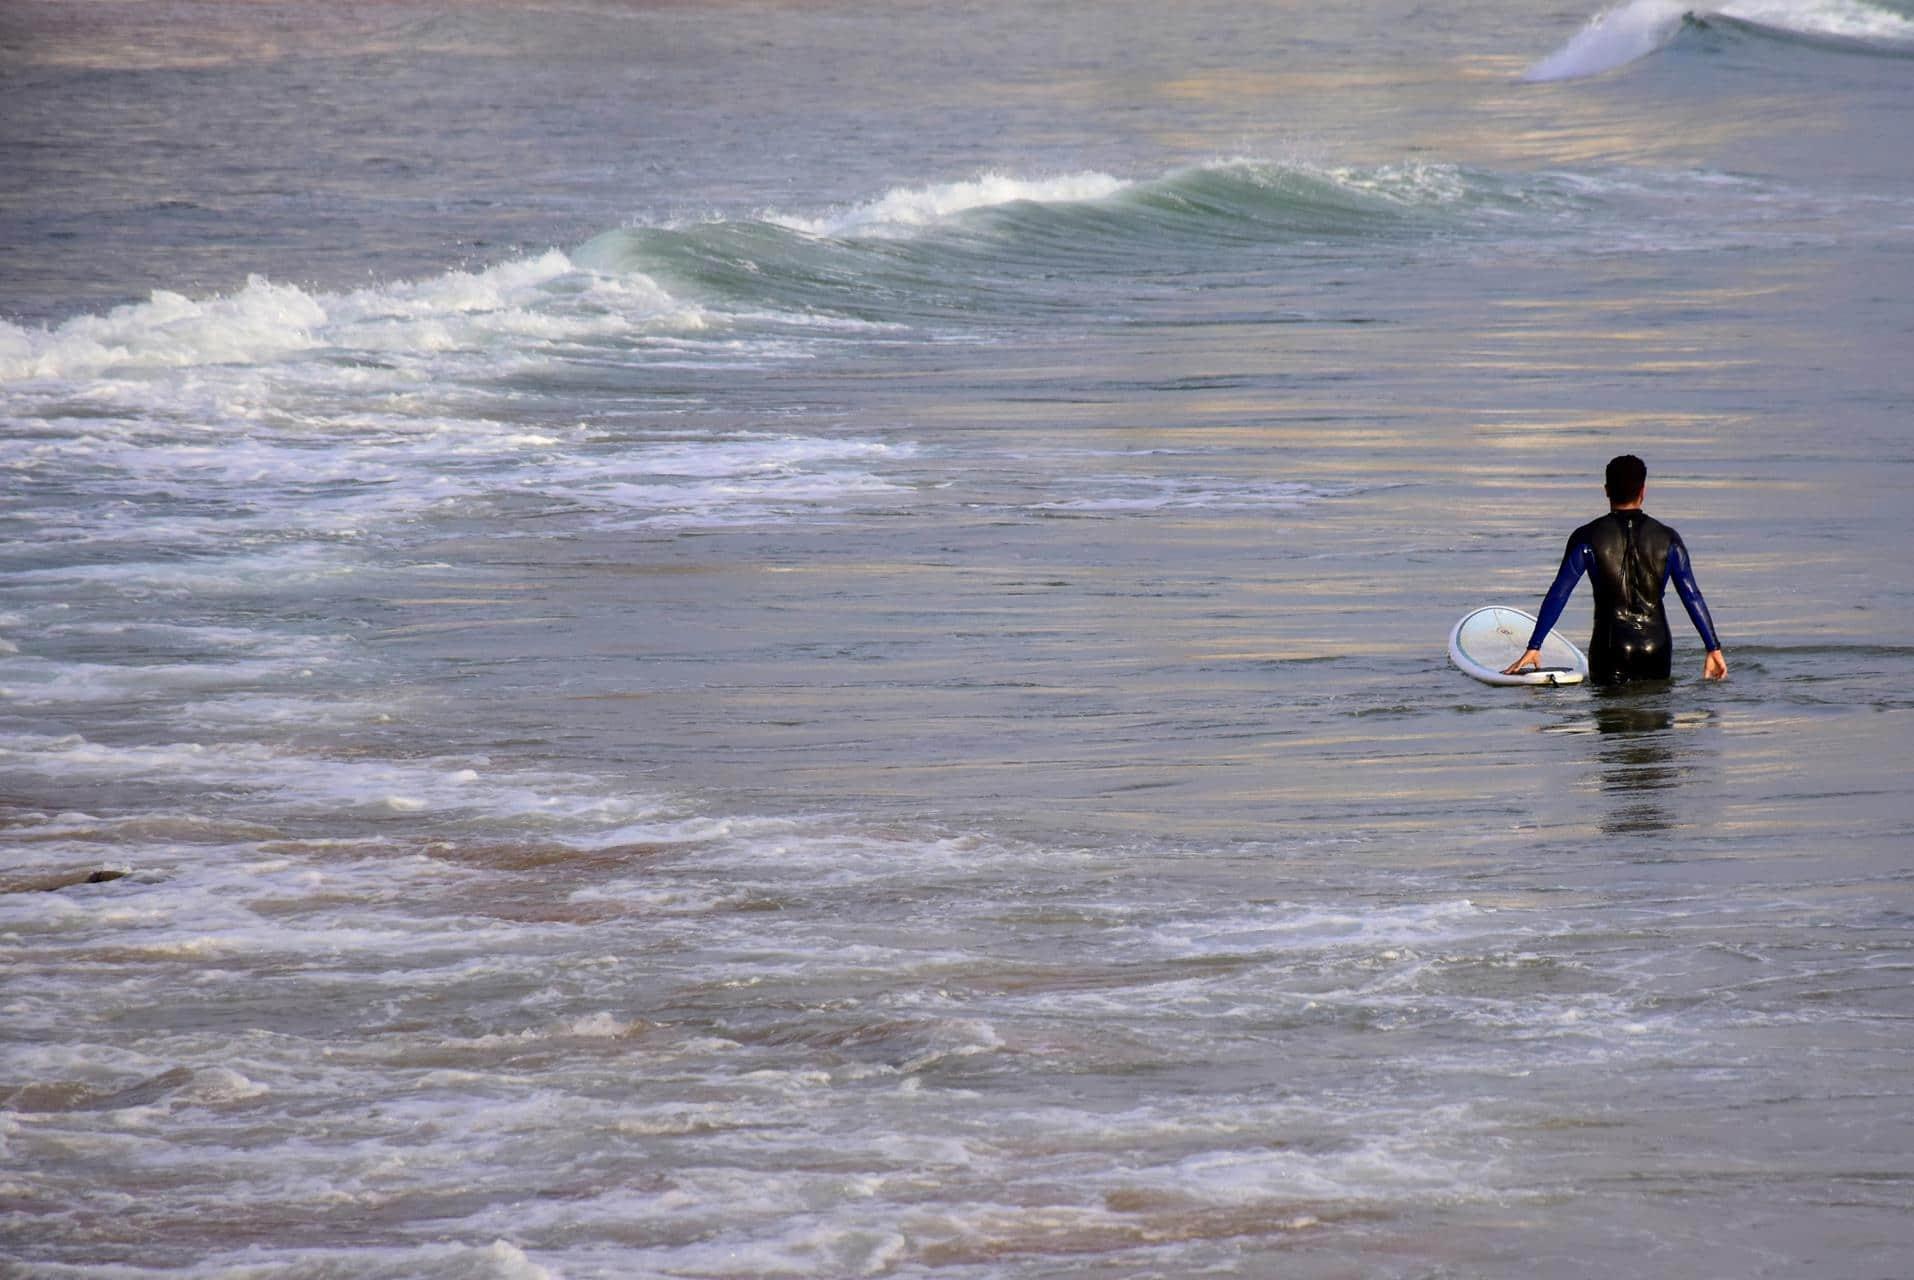 preparing to surf in blue waves